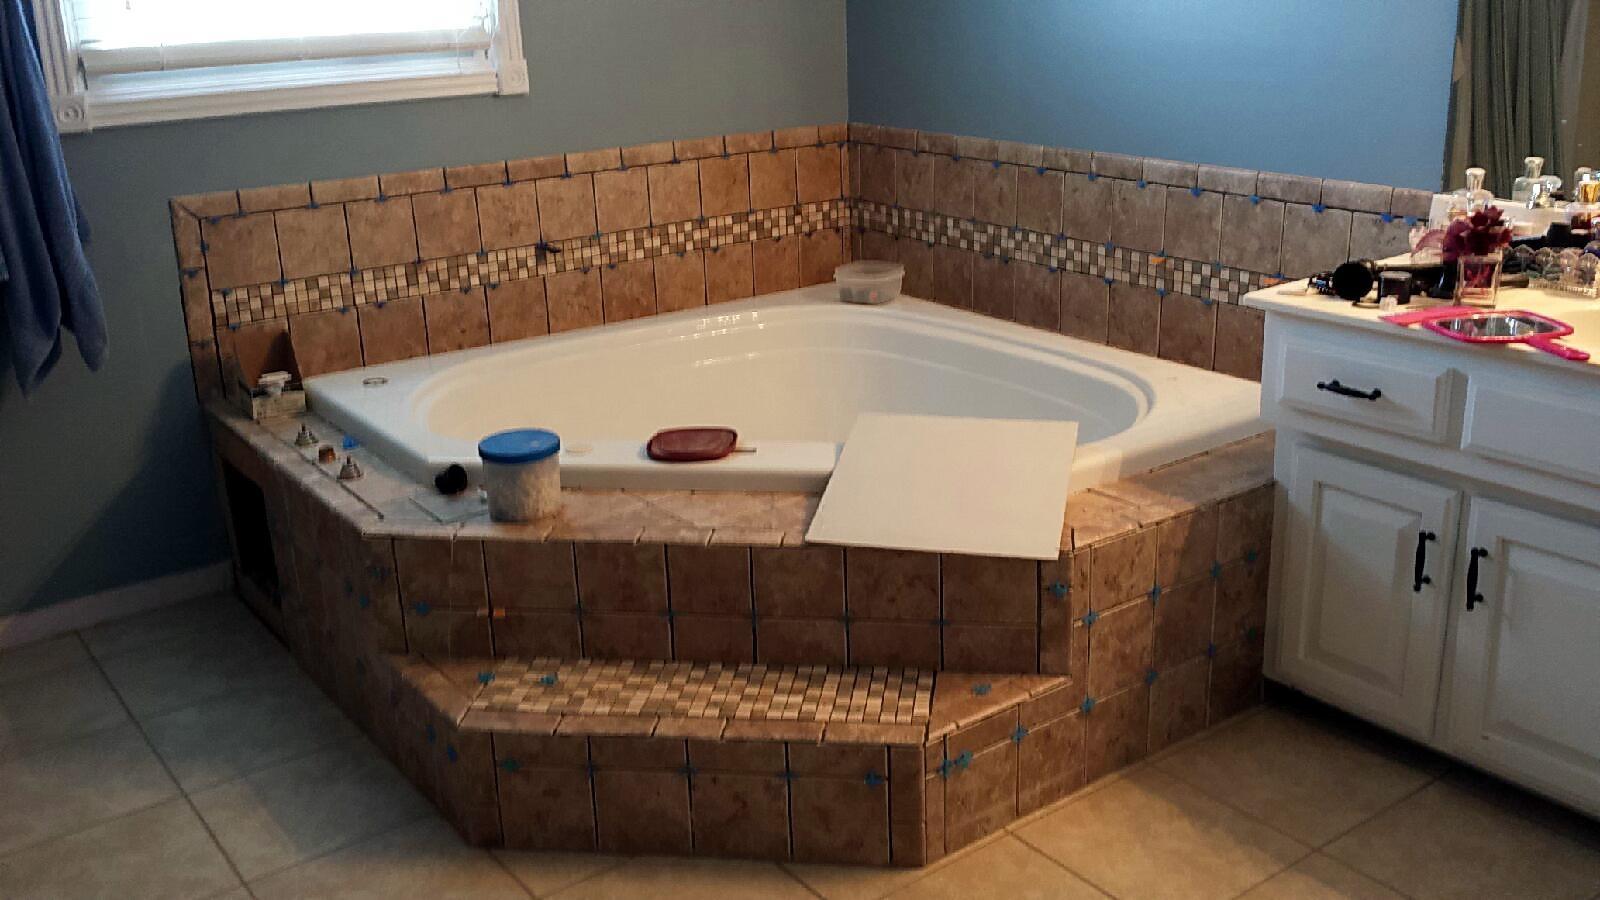 Ceramic tile installation tiles by angel llc ceramic flooring hot tubs installation doublecrazyfo Gallery